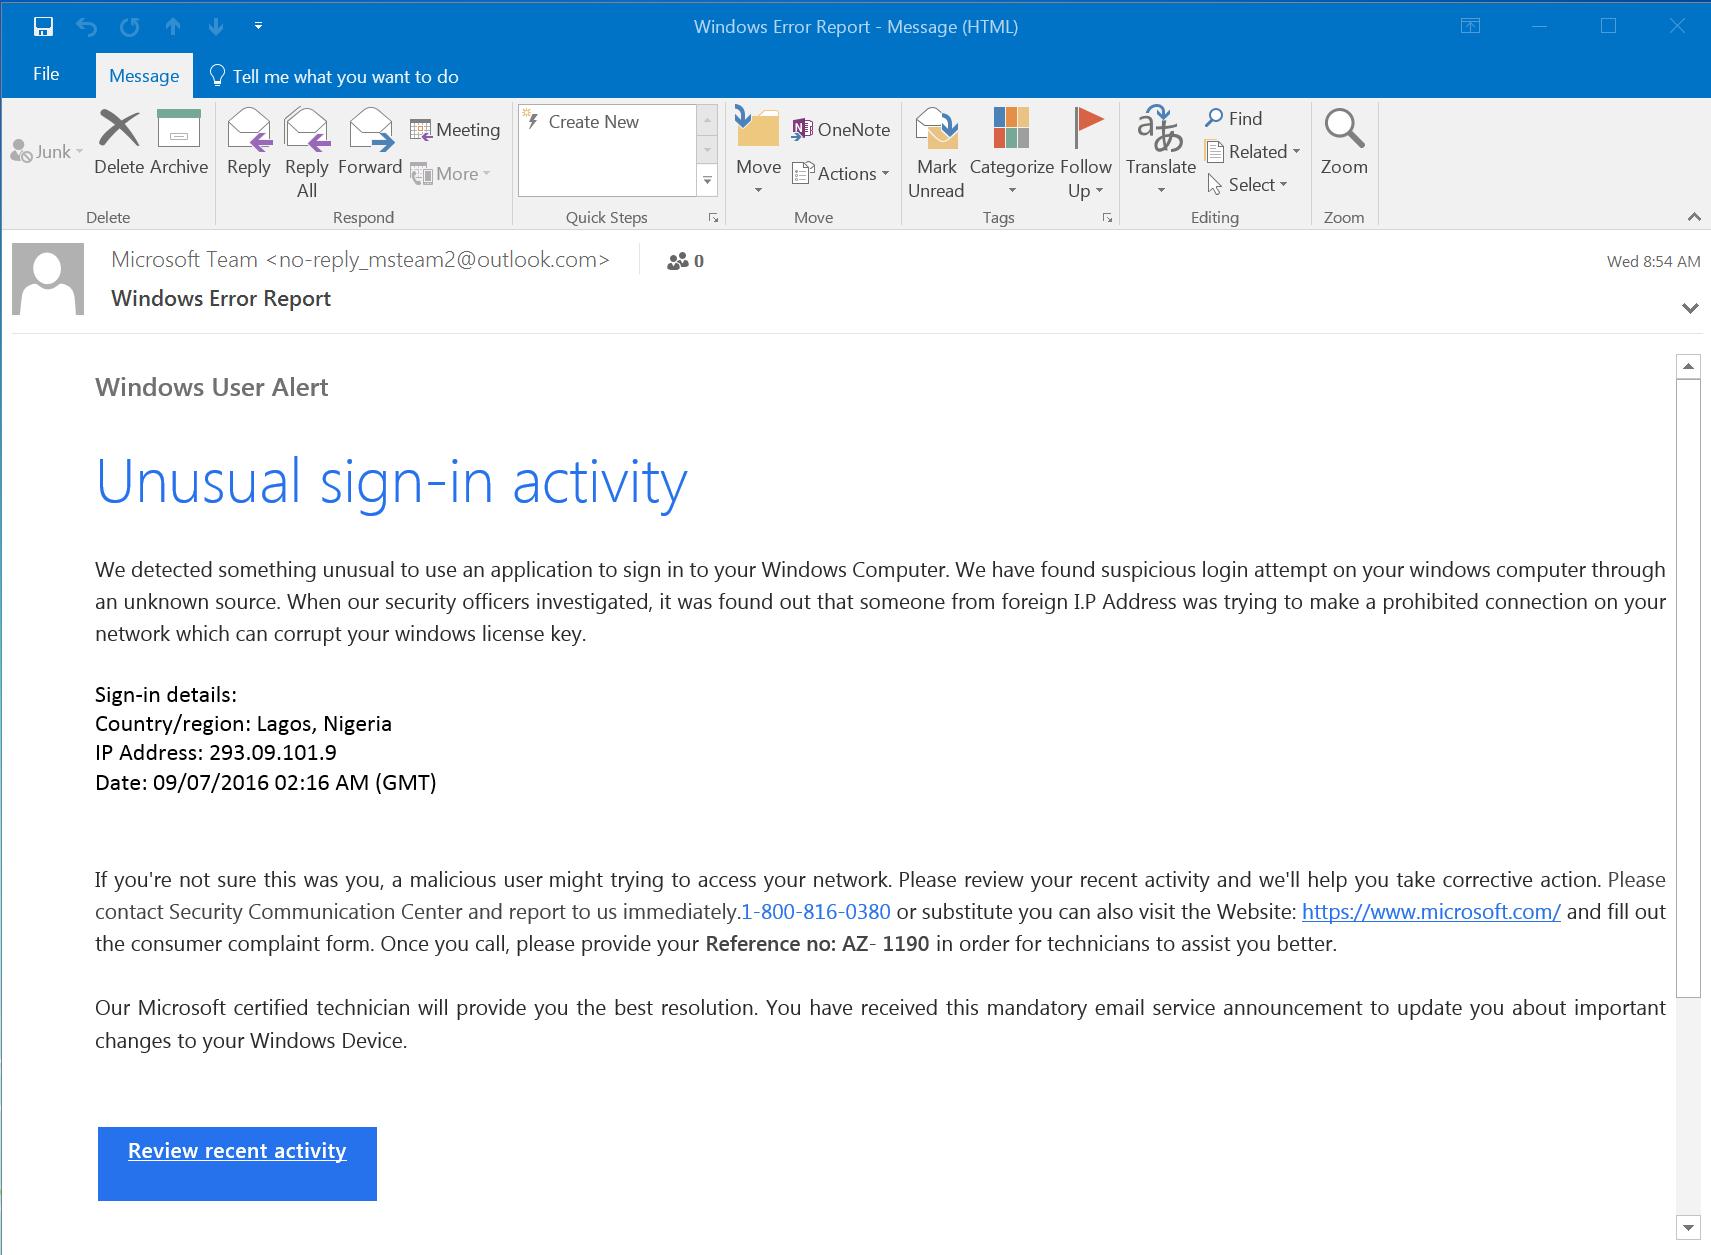 Malicious Windows Warning Email